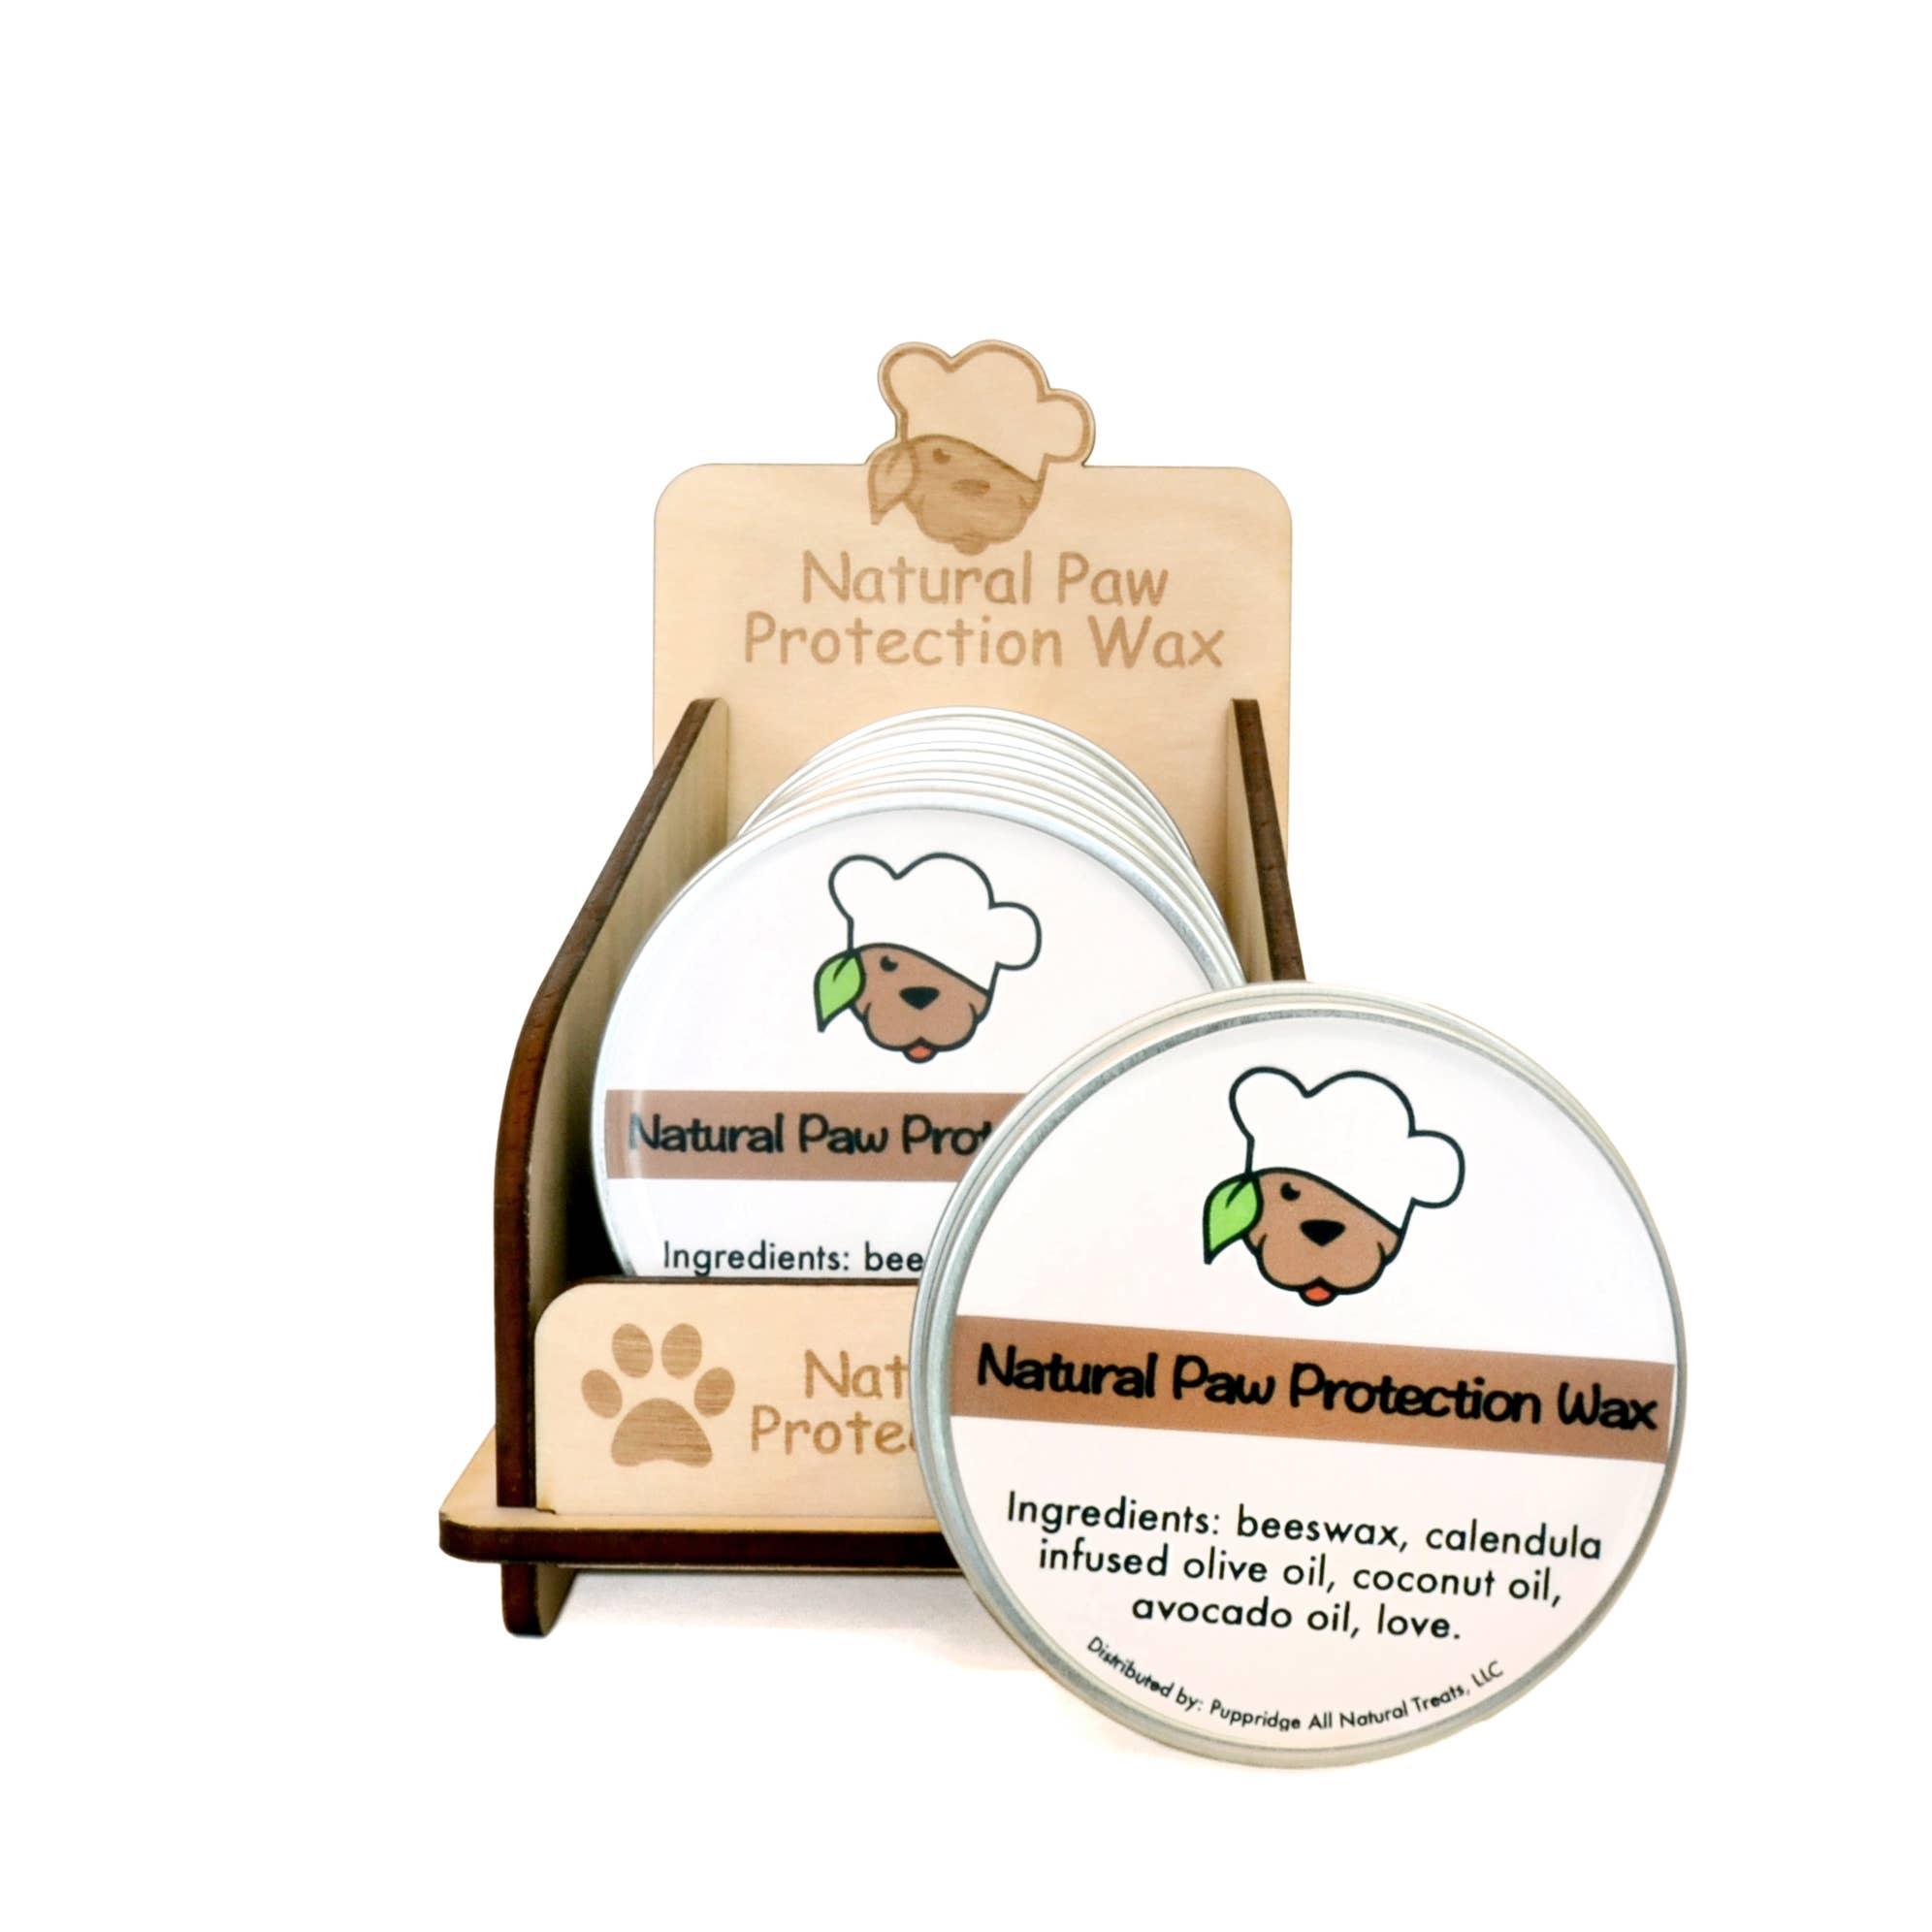 Engraved Wooden Paw Wax Tin DISPLAY | Trada Marketplace